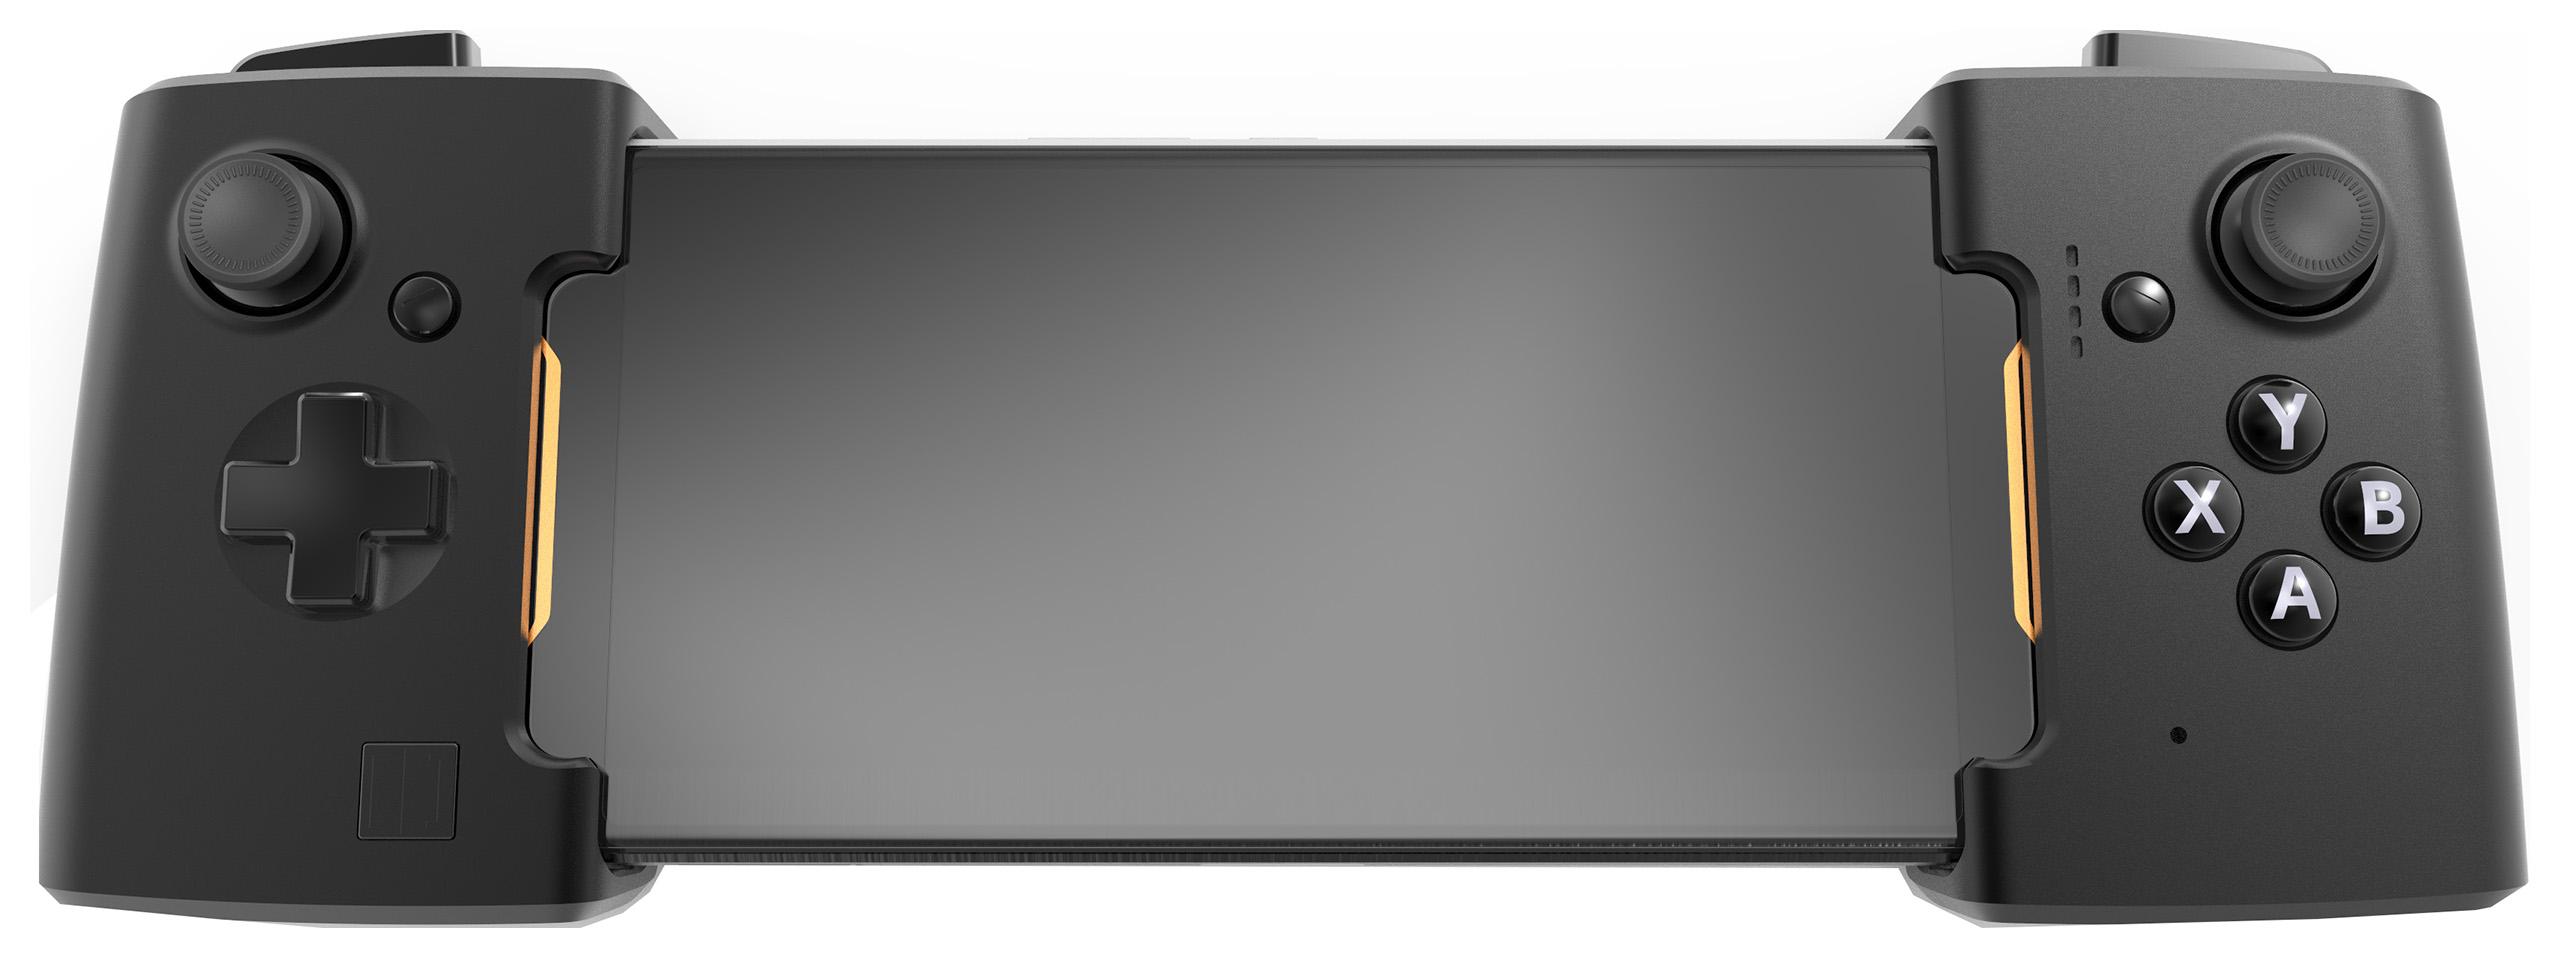 Геймпад Asus Gamevice Black (90AC0390 BCL001)